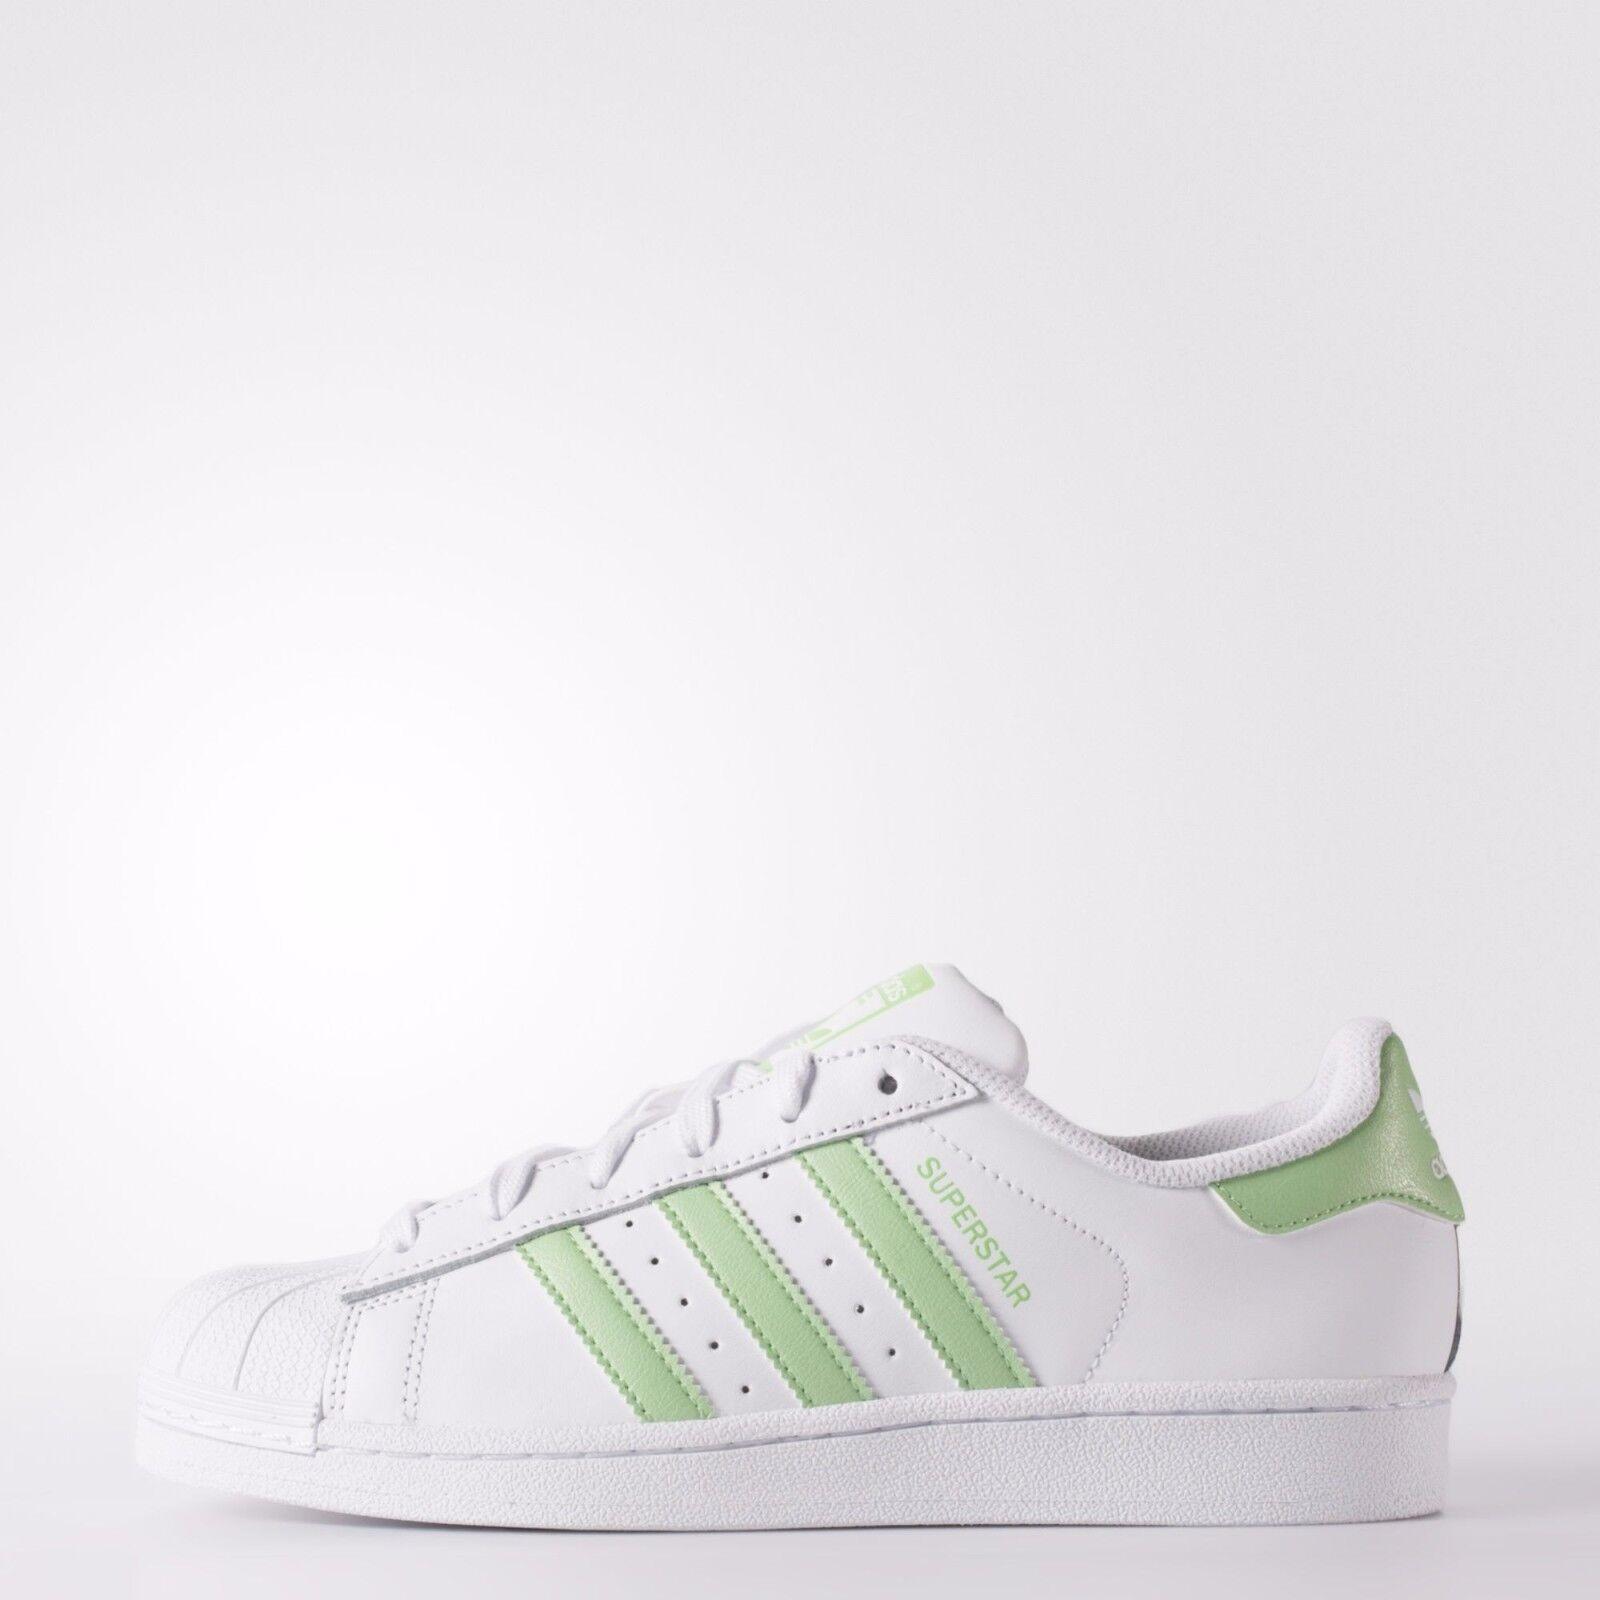 Adidas Originals Superstar BB5451 Women's Supgrn White Green Authentic Rare